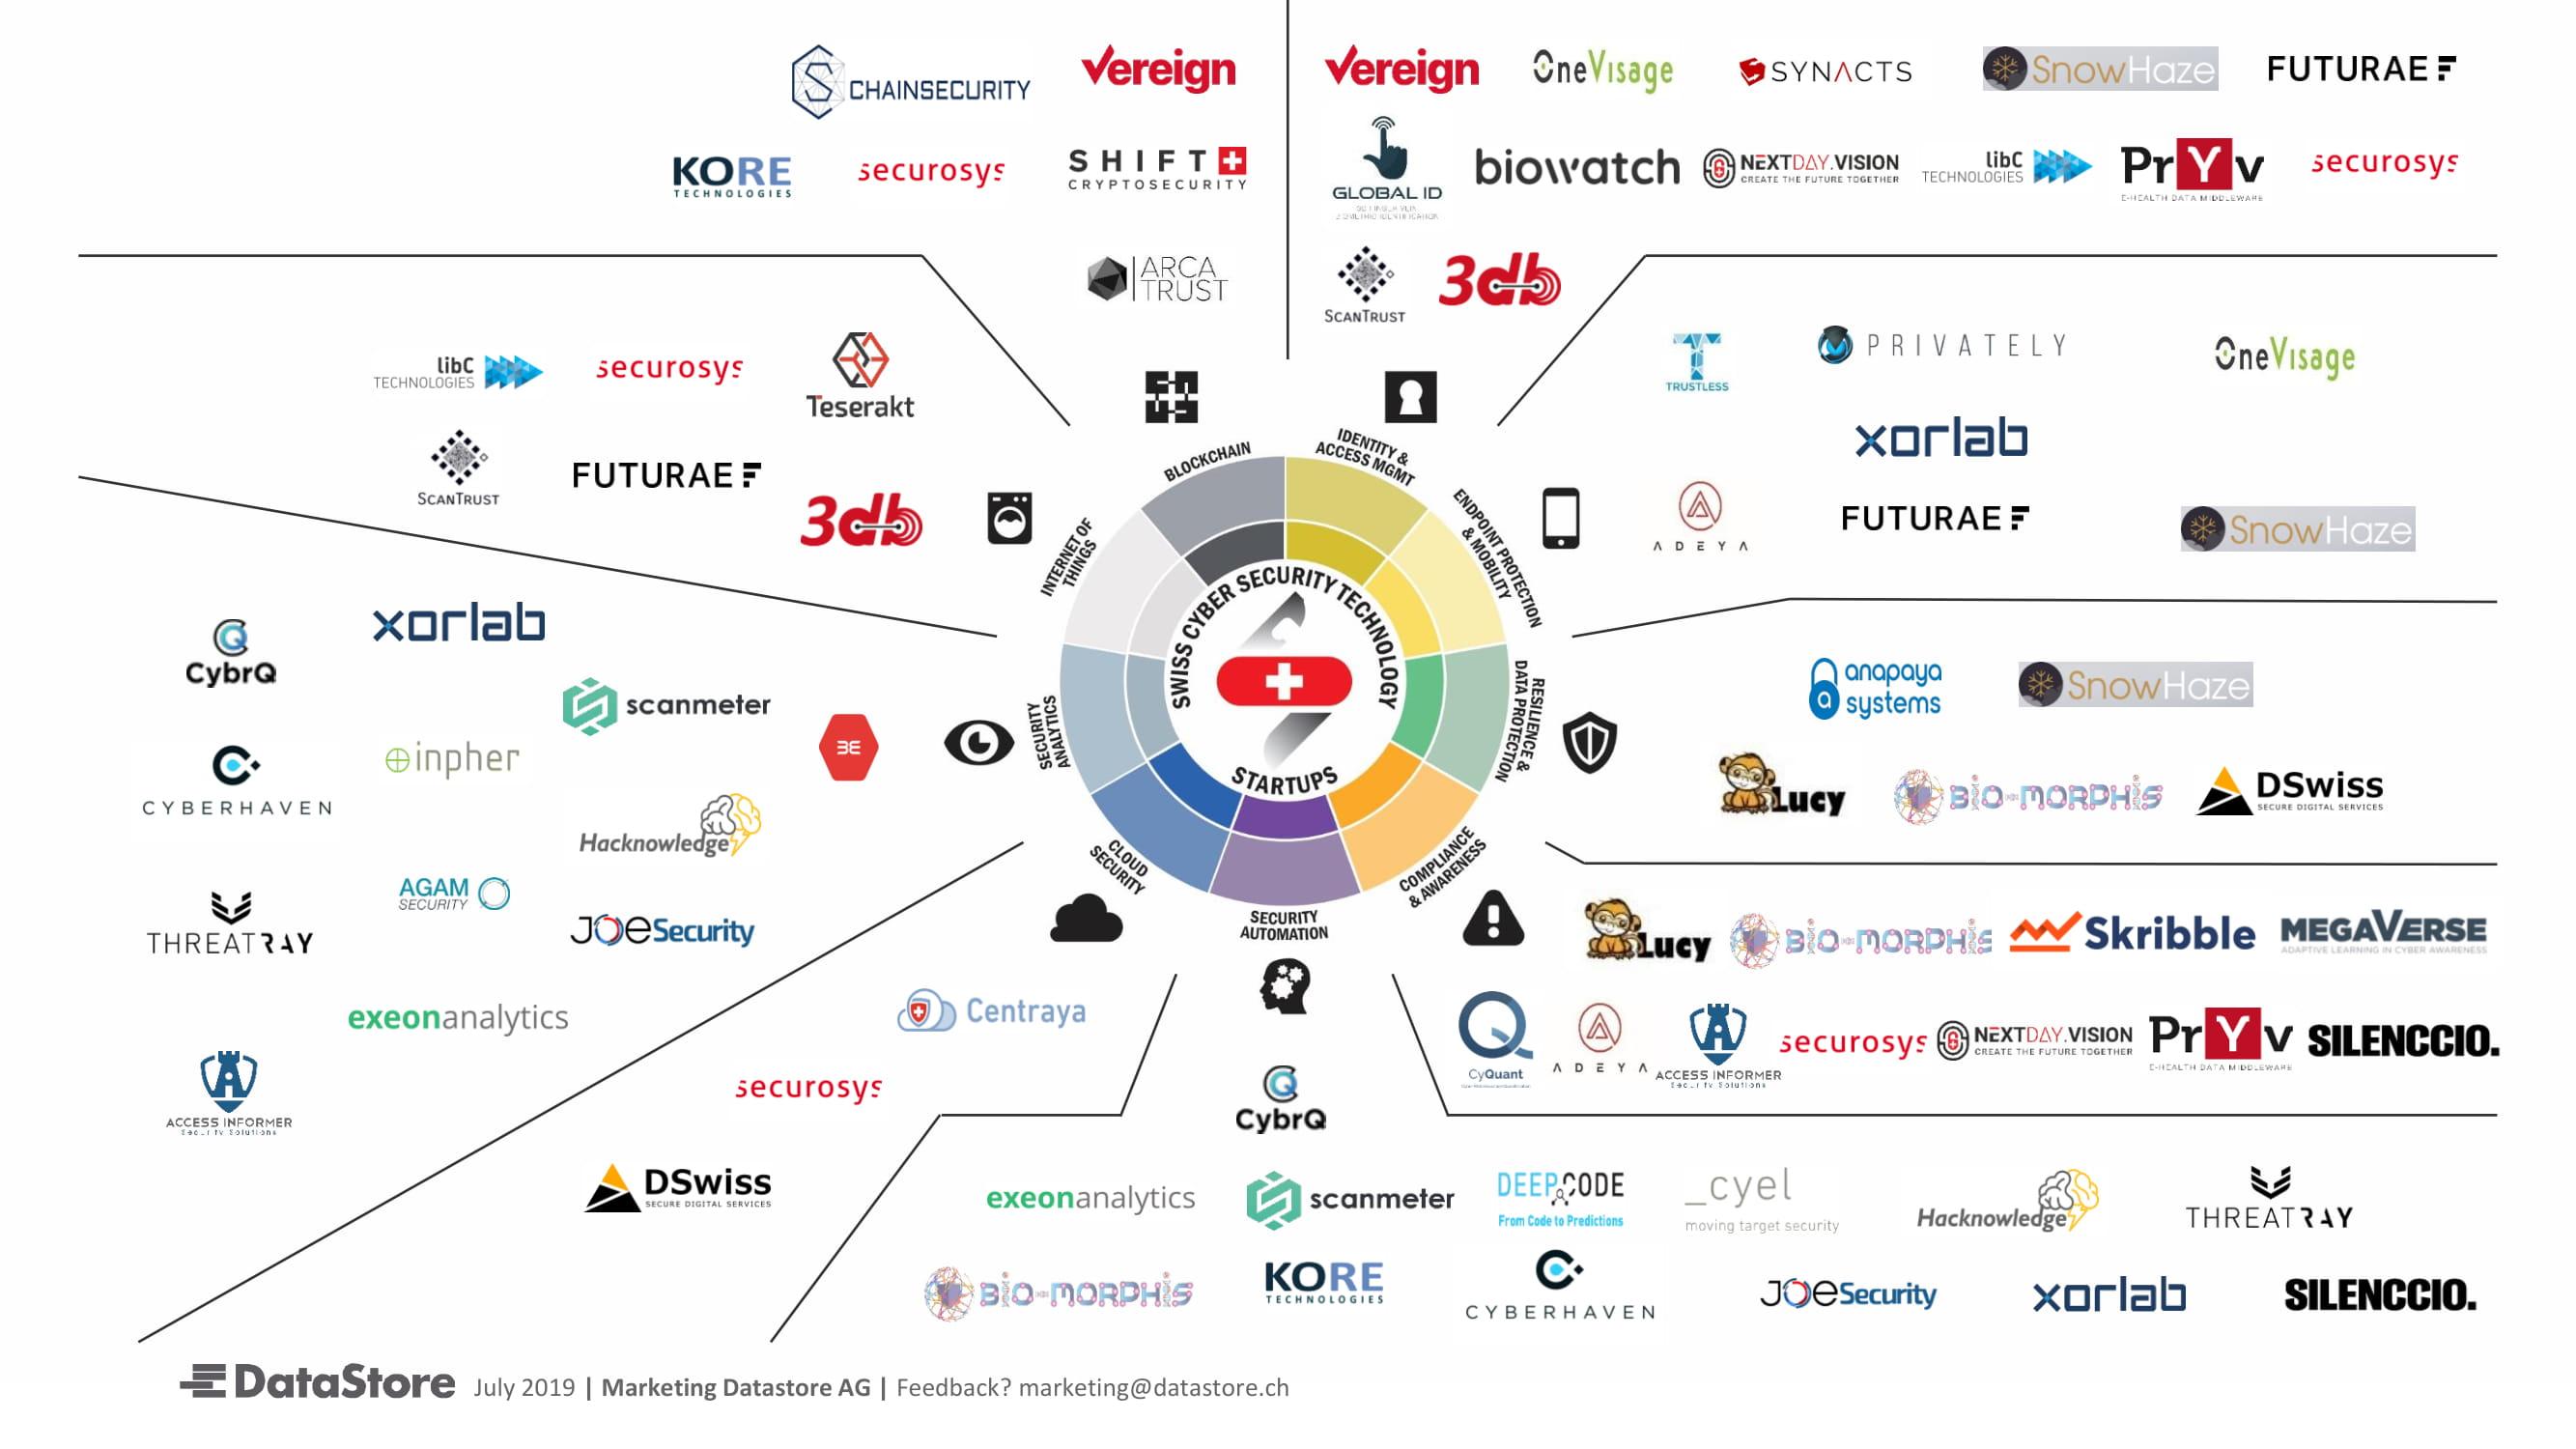 DS SwissCybersecurity Technology Startups